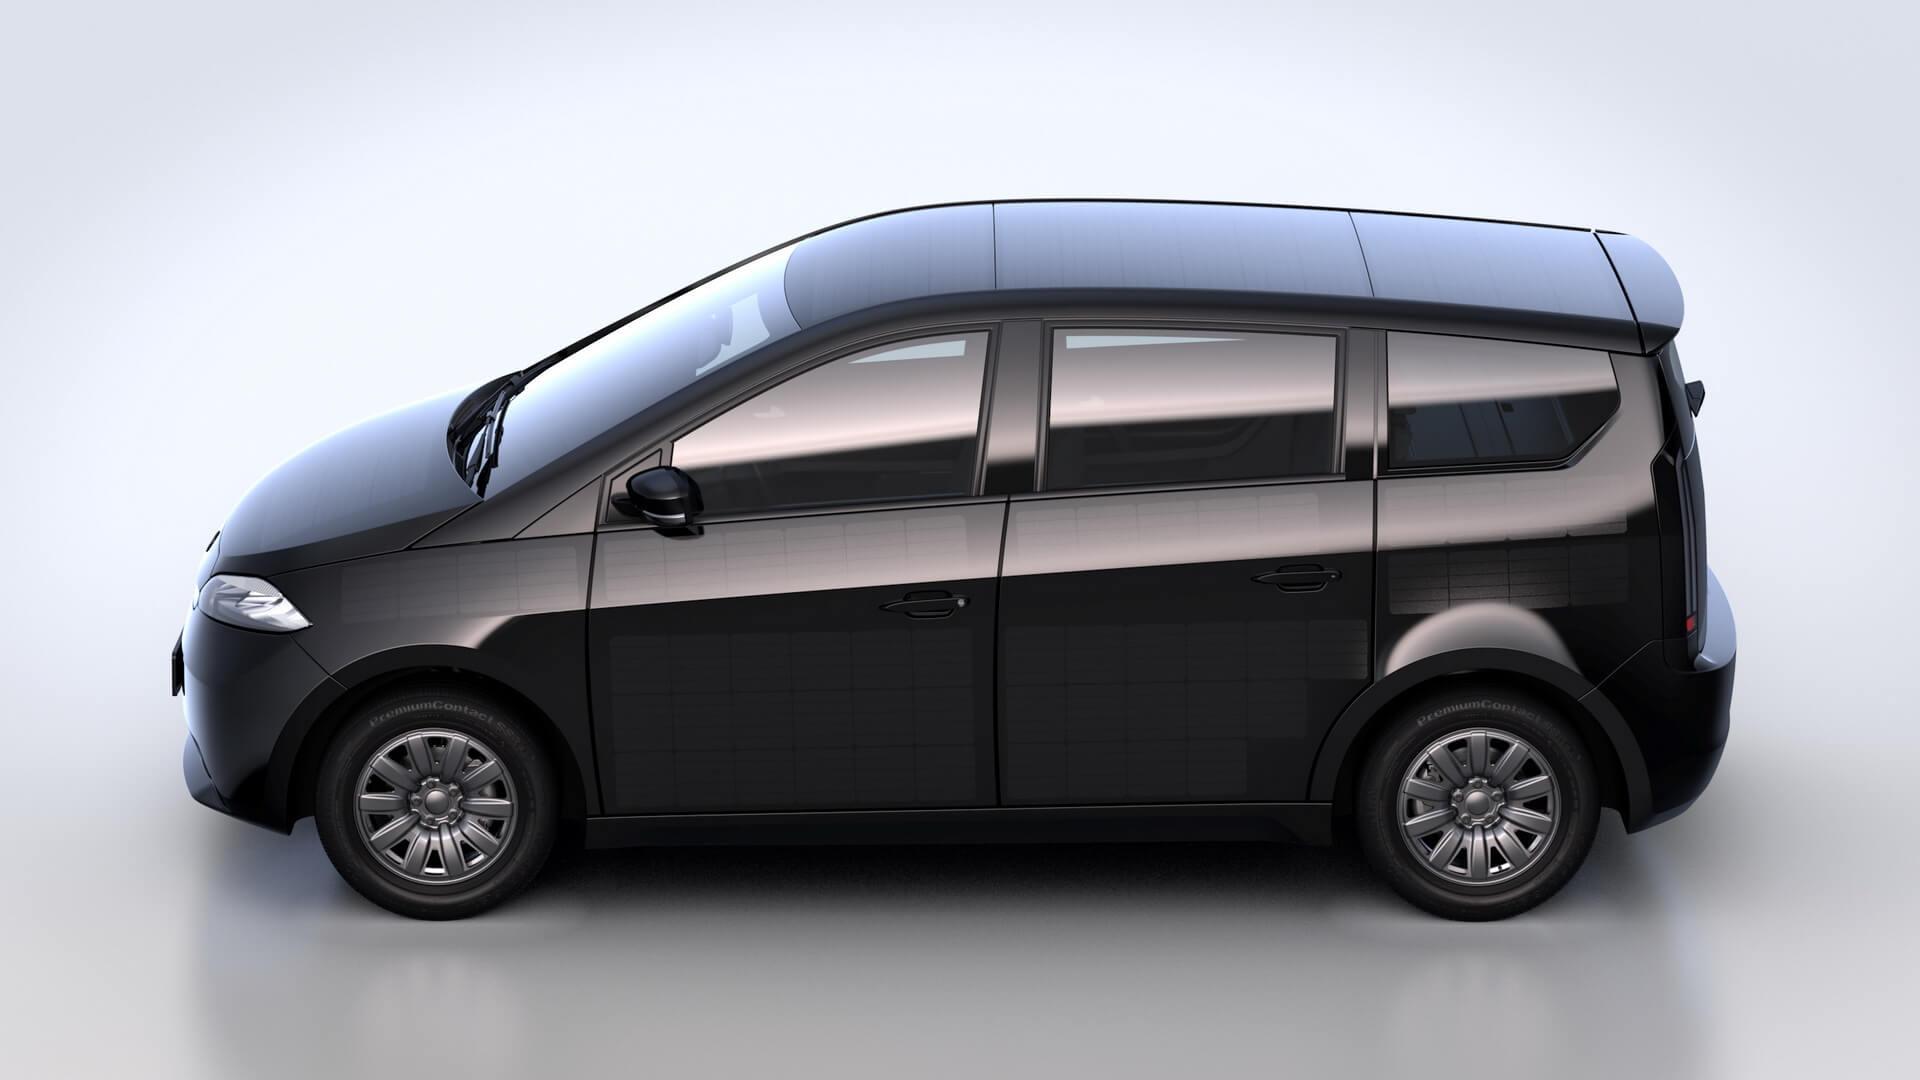 Электромобиль Sion: автономность запаса хода без розетки 34км